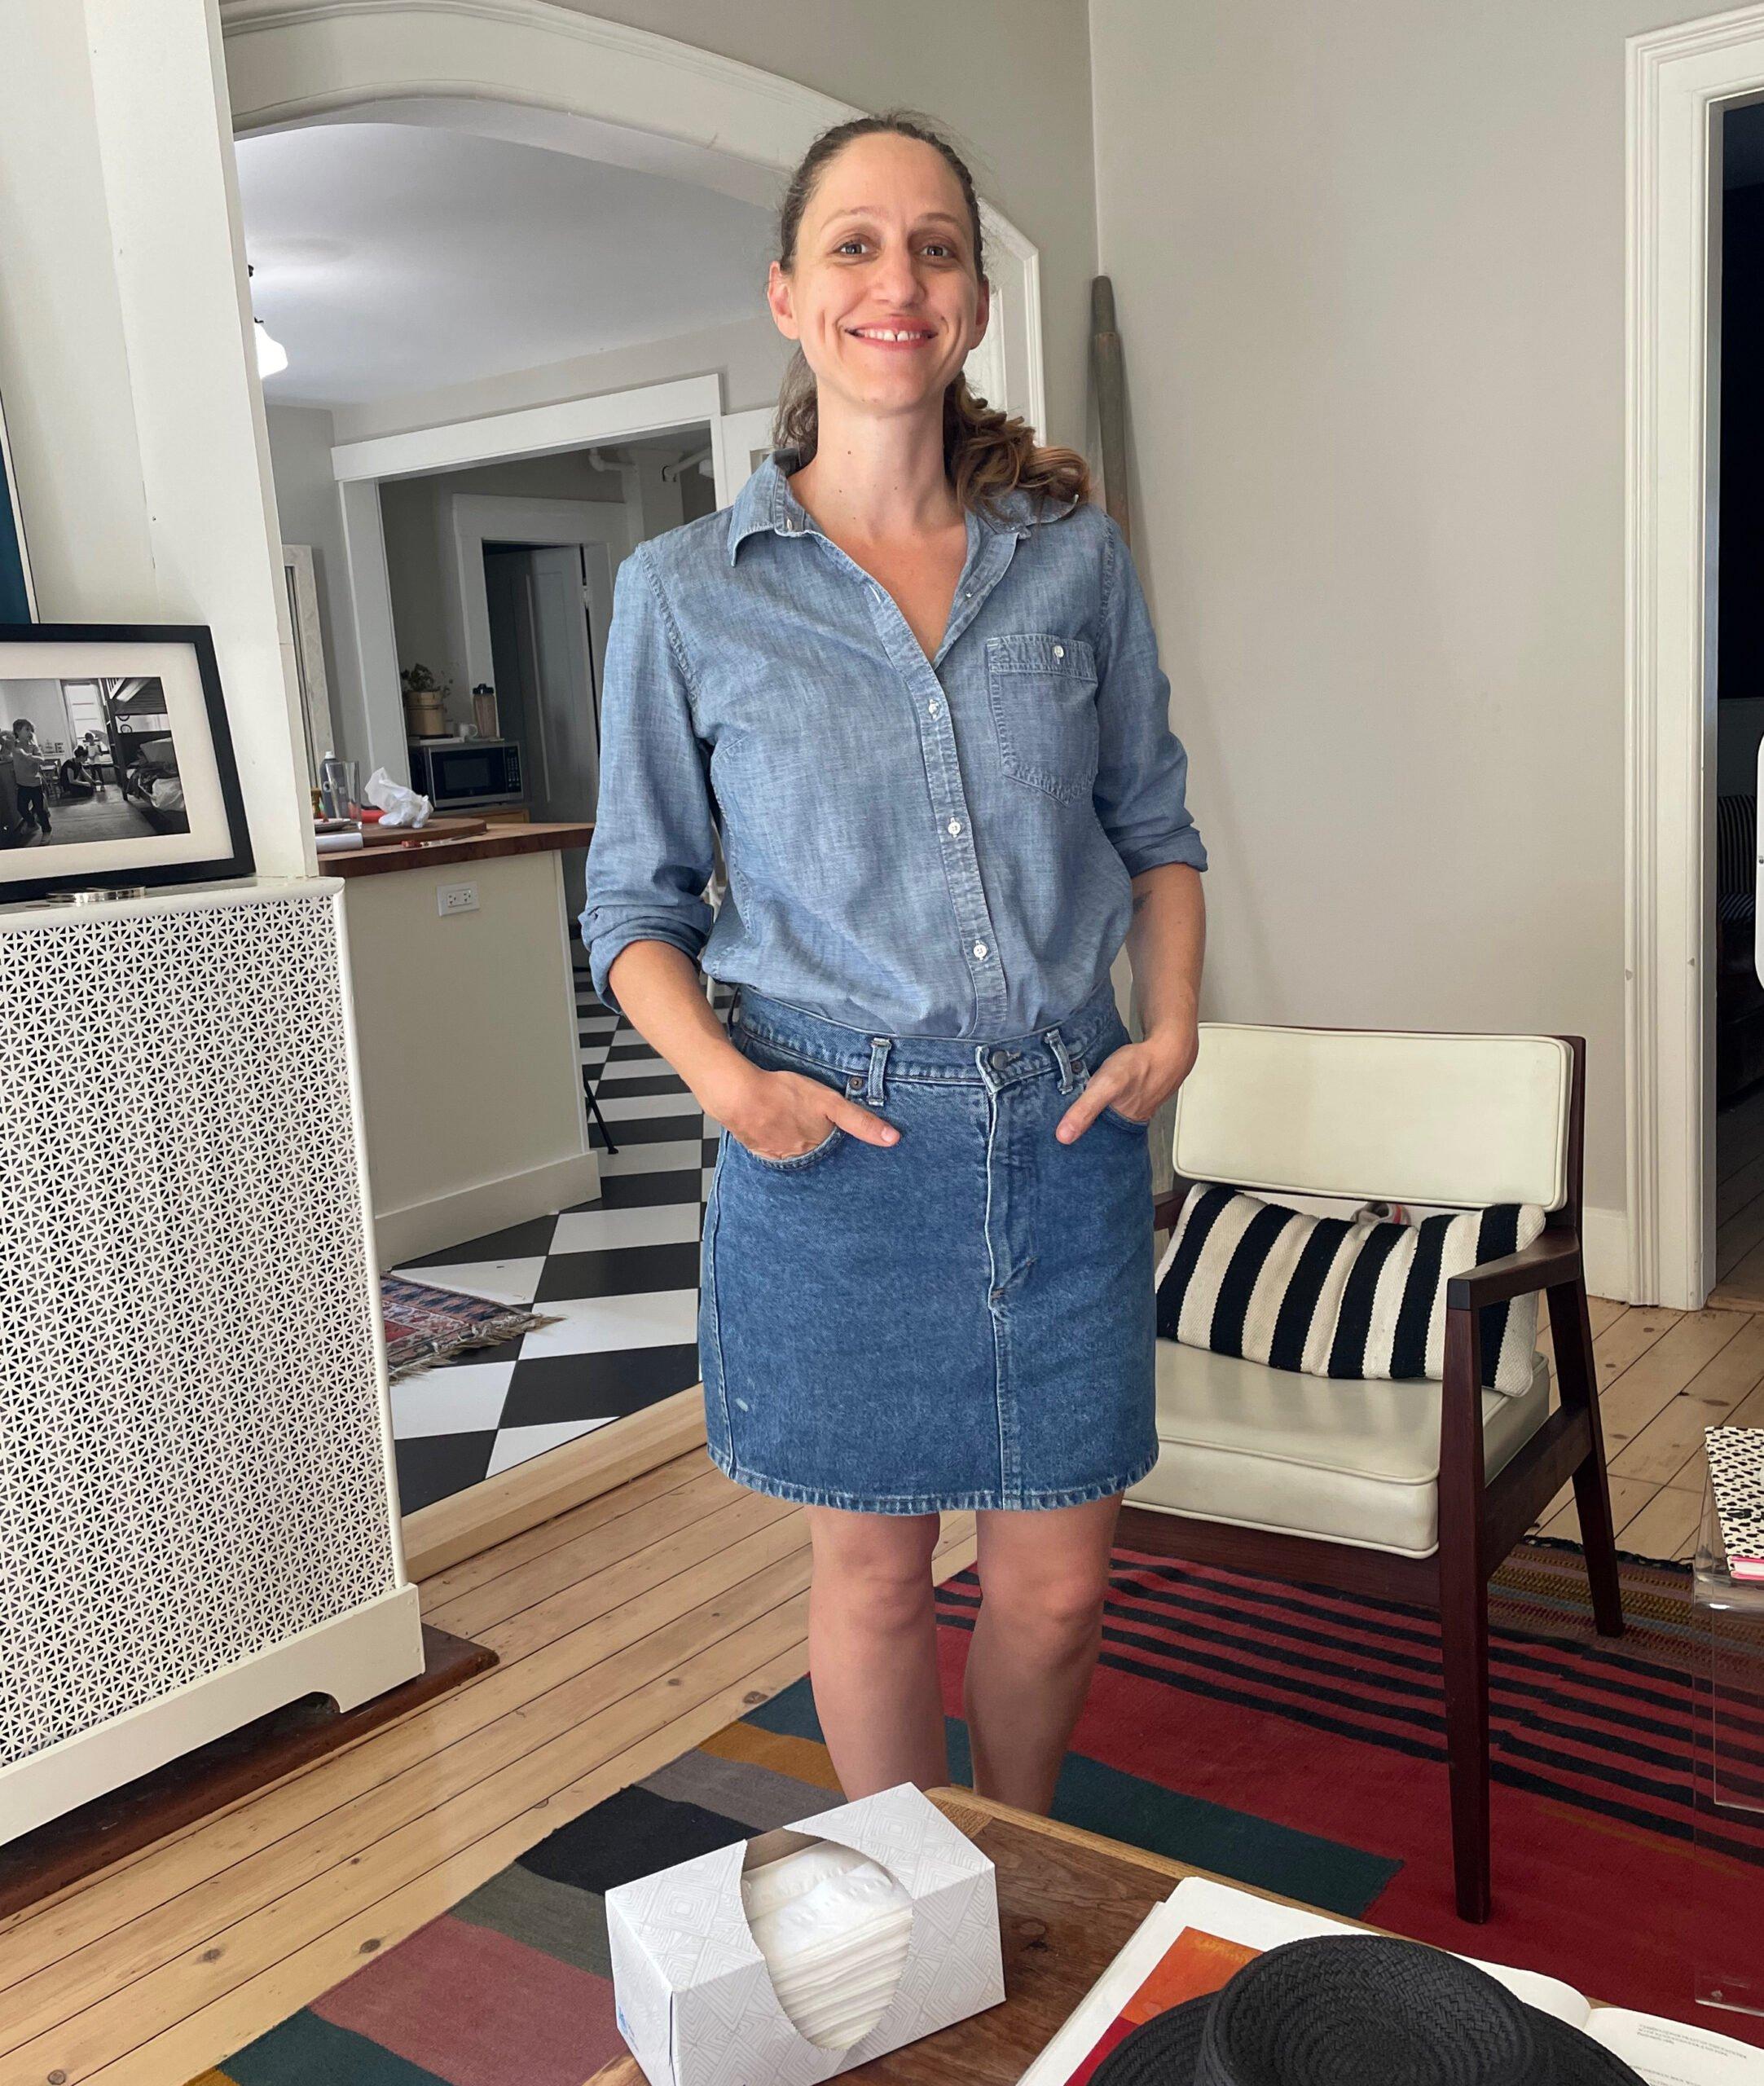 jean skirt sharon Beesley